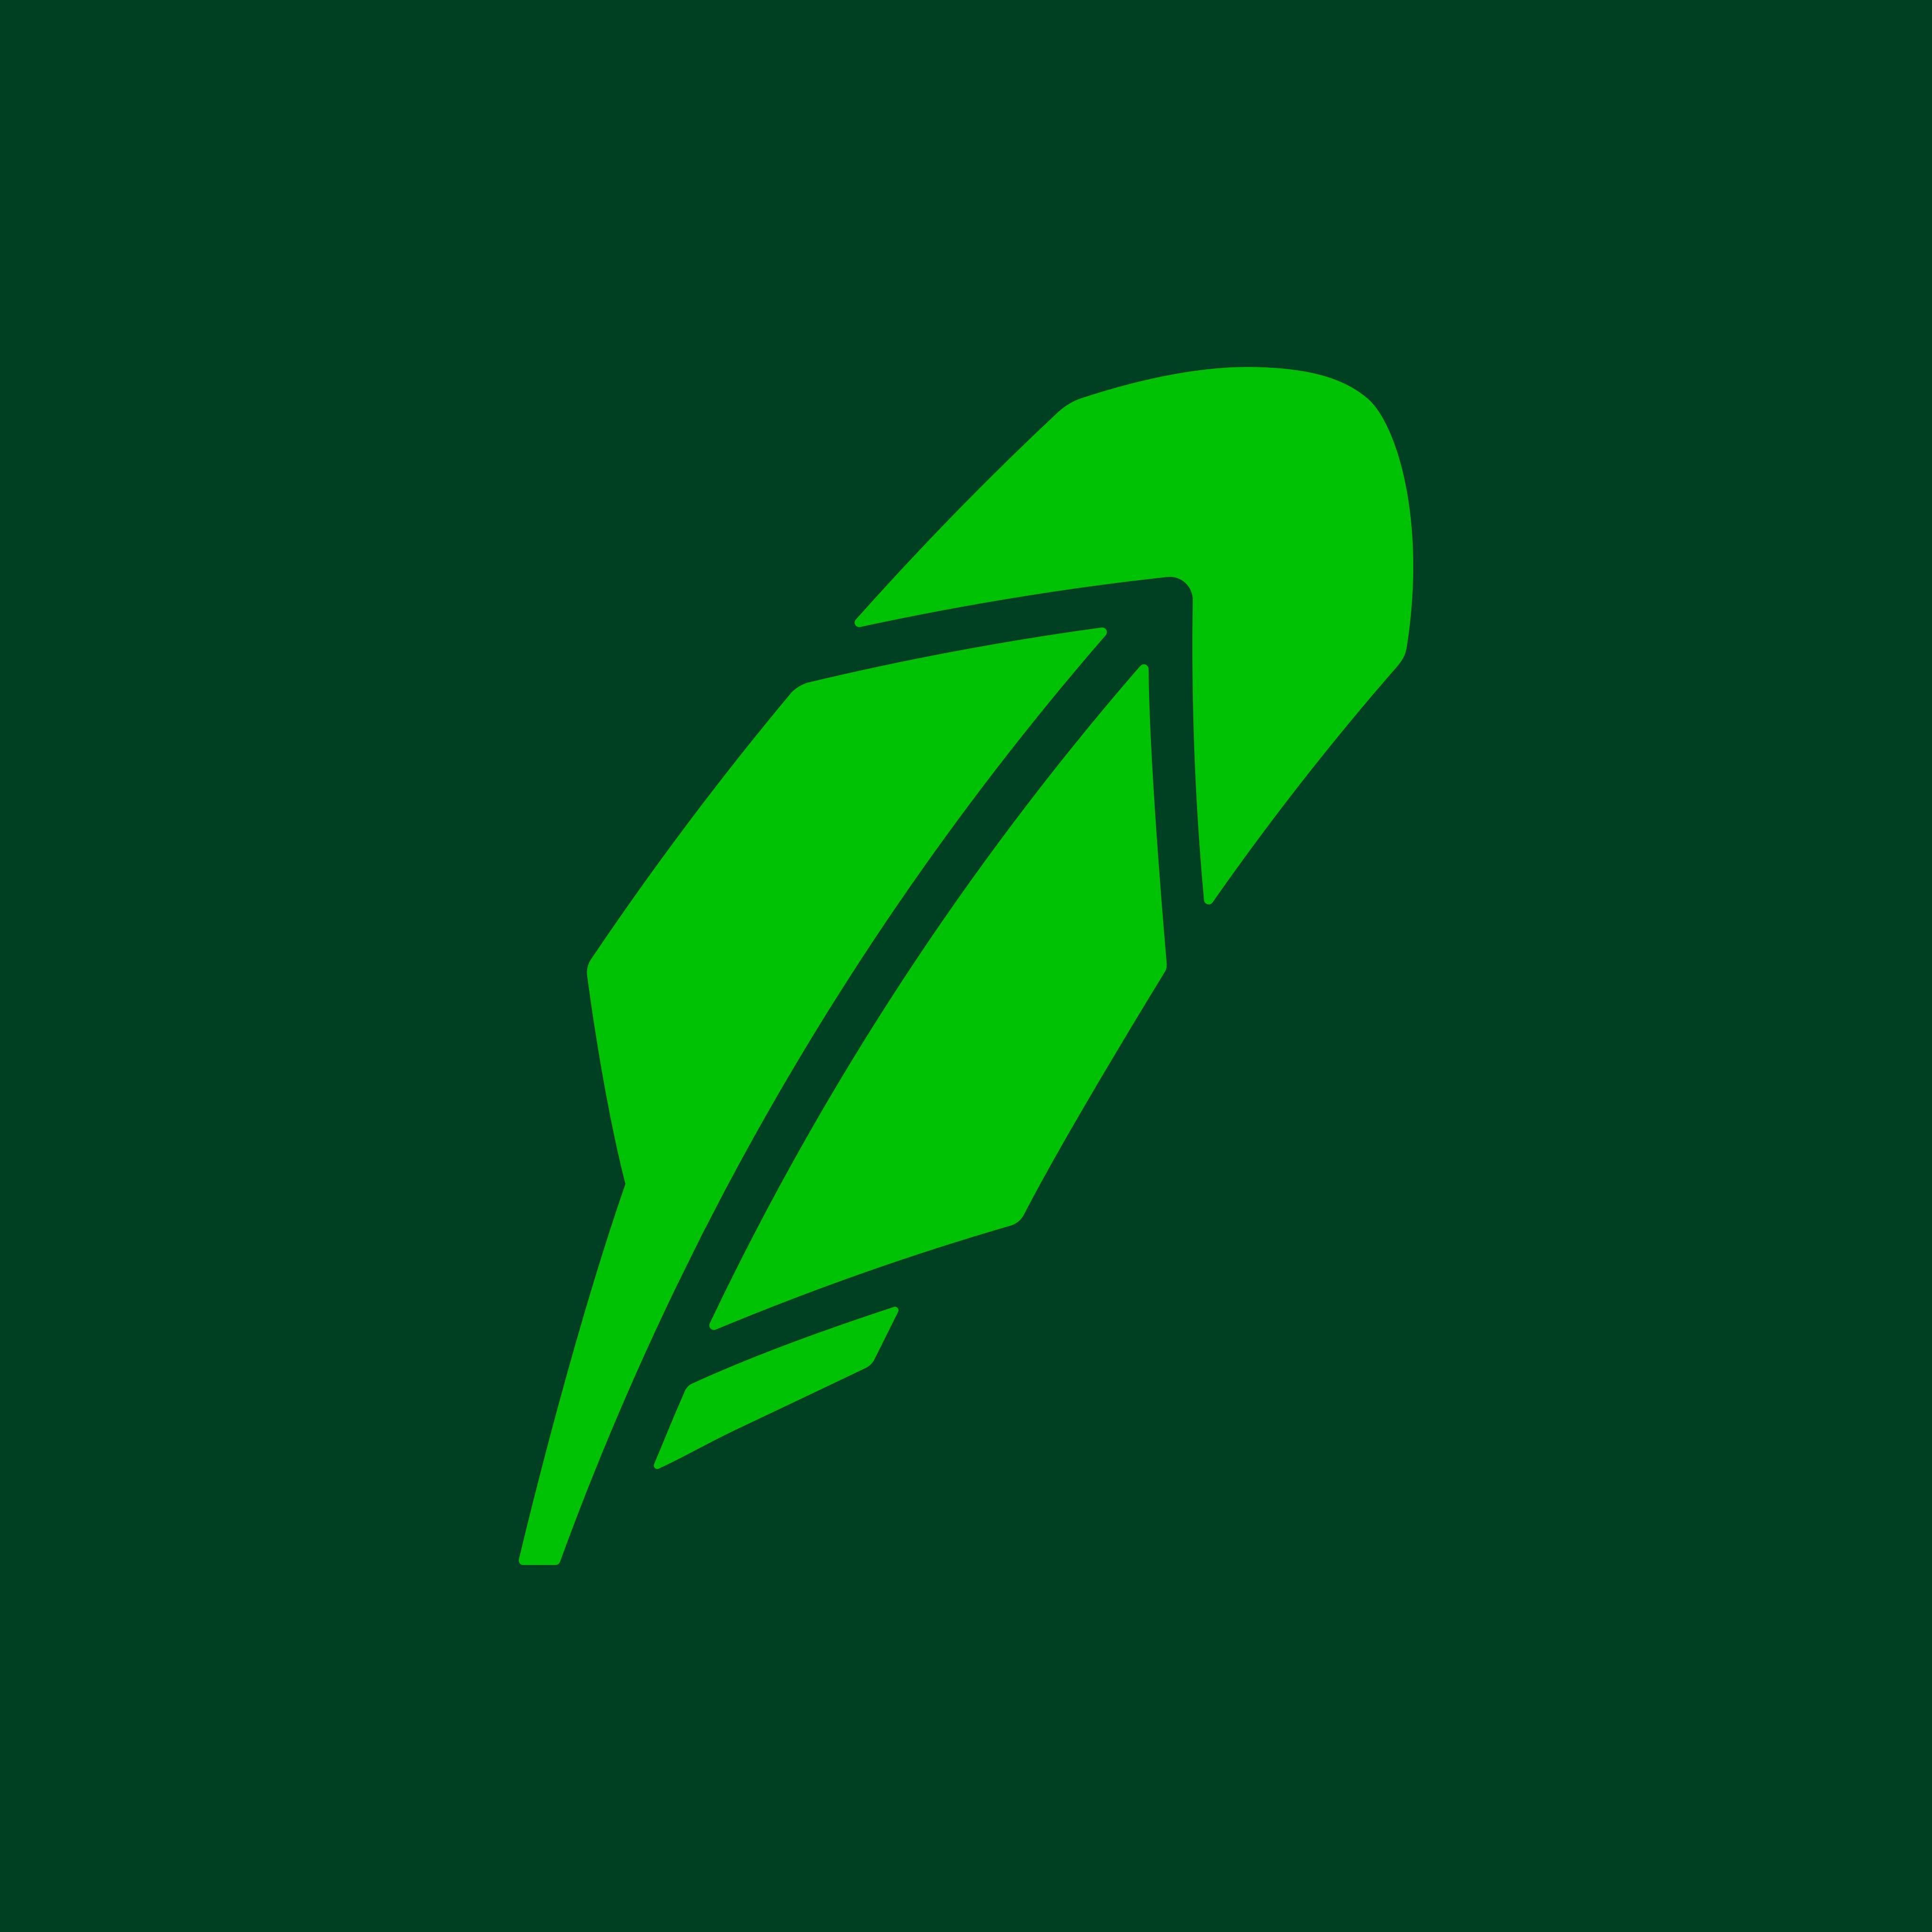 robinhood logo 6 - Robinhood Logo